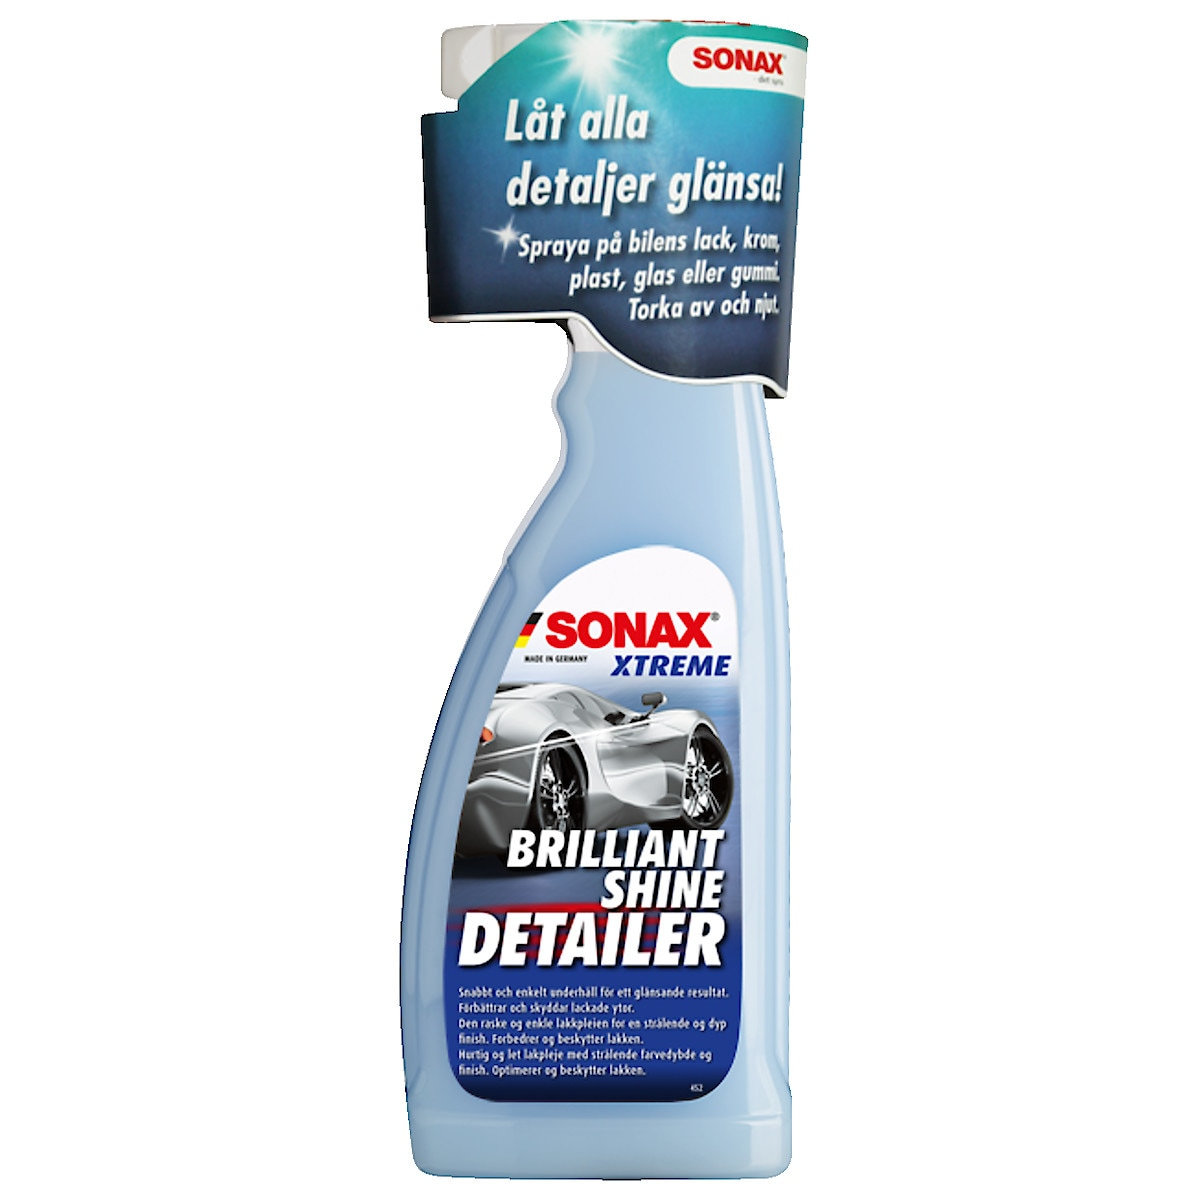 Snabbvax Xtreme Brilliant Shine Detailer Sonax 750 ml